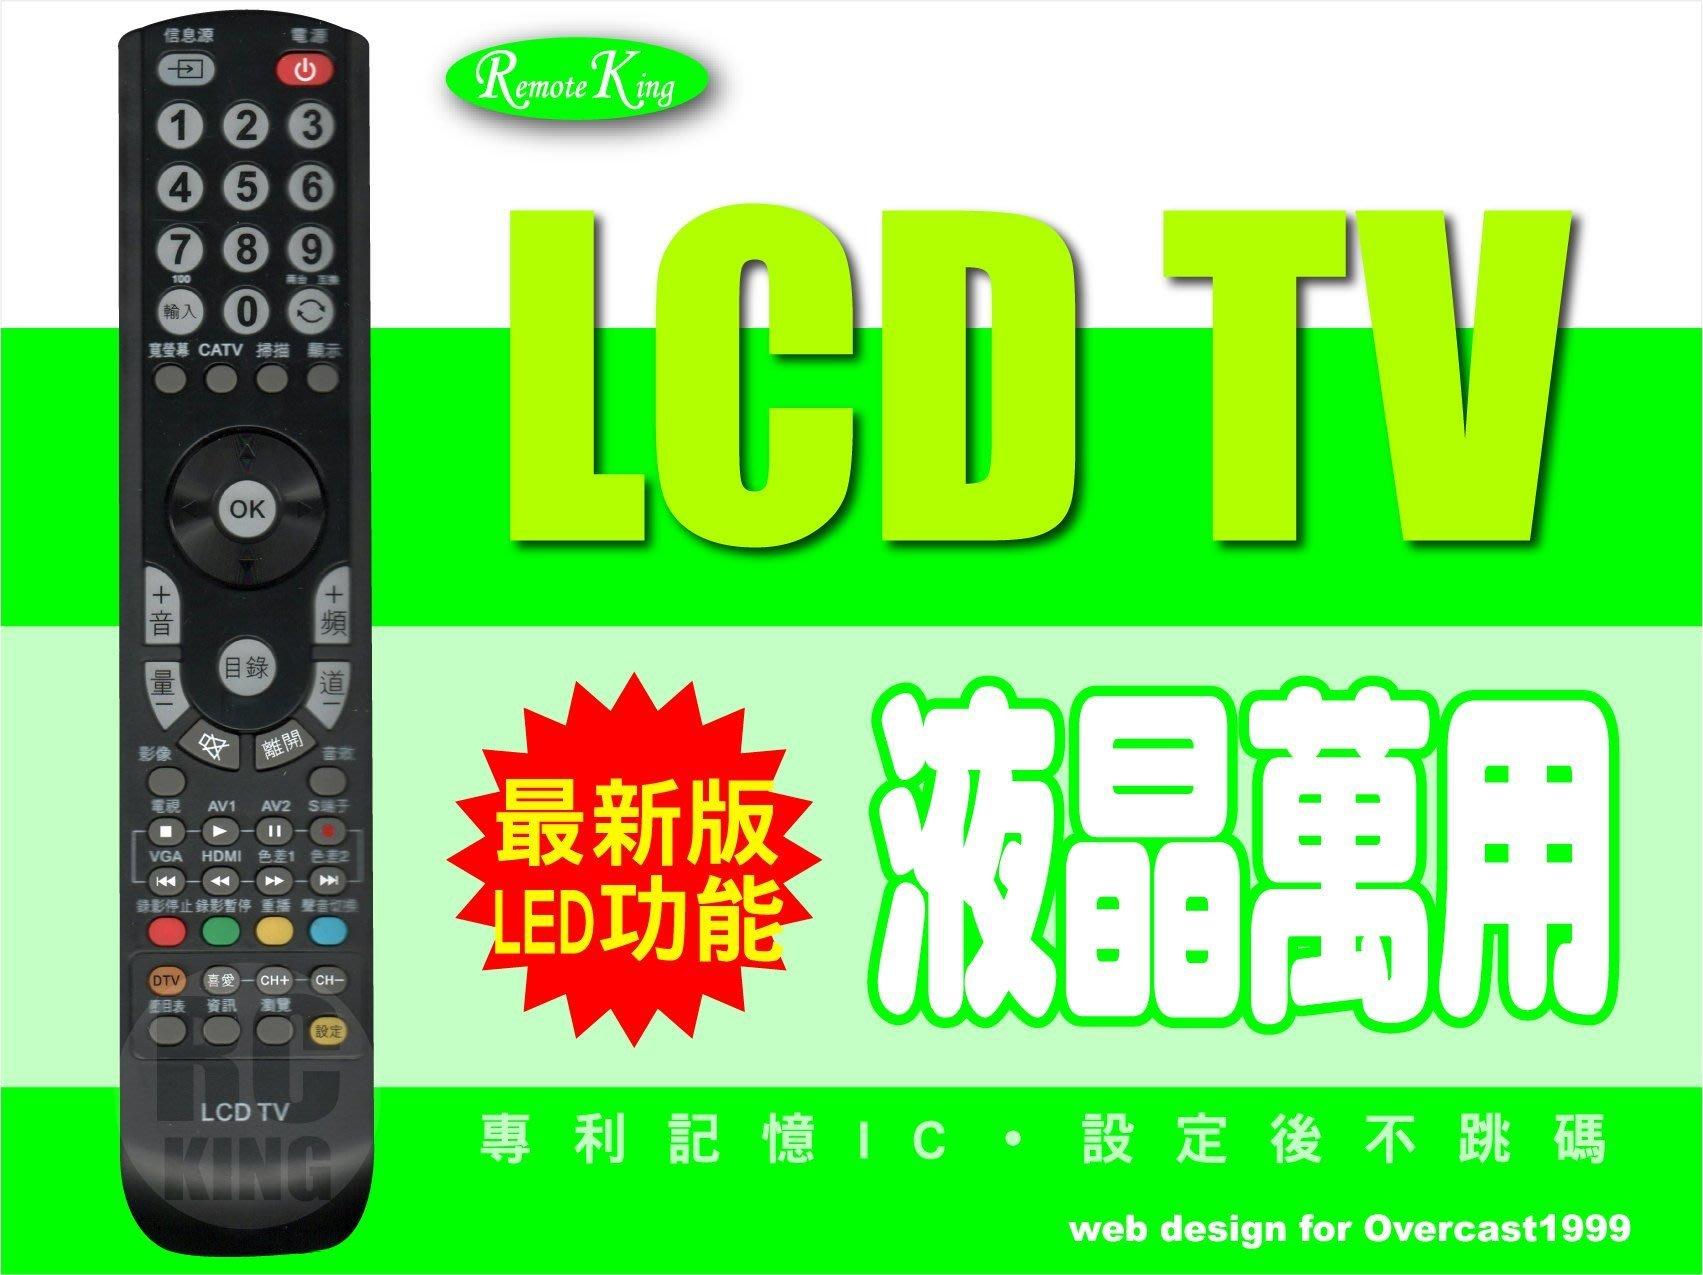 【遙控王】LED液晶多功能遙控器_適用Westinghouse 西屋_SK-22S640G、WDE-TW-22